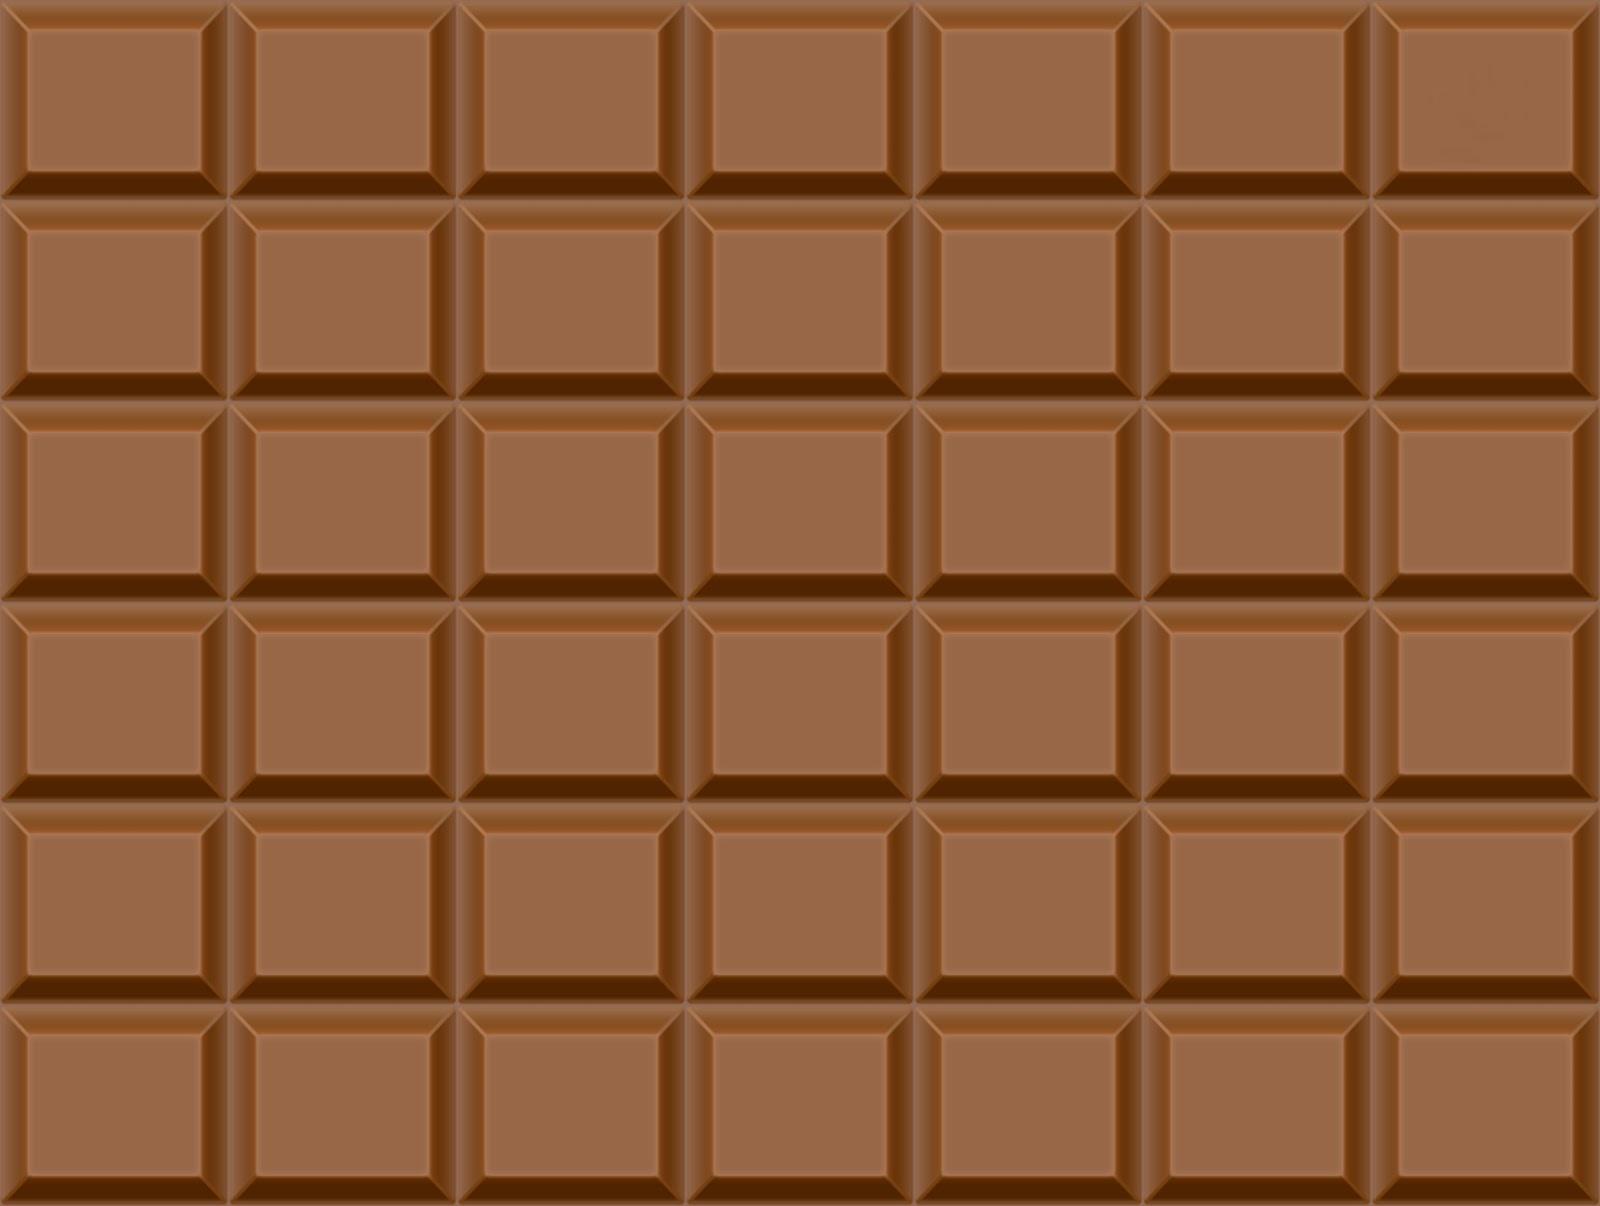 Текстура коричневый шоколад квадратики картинки фото